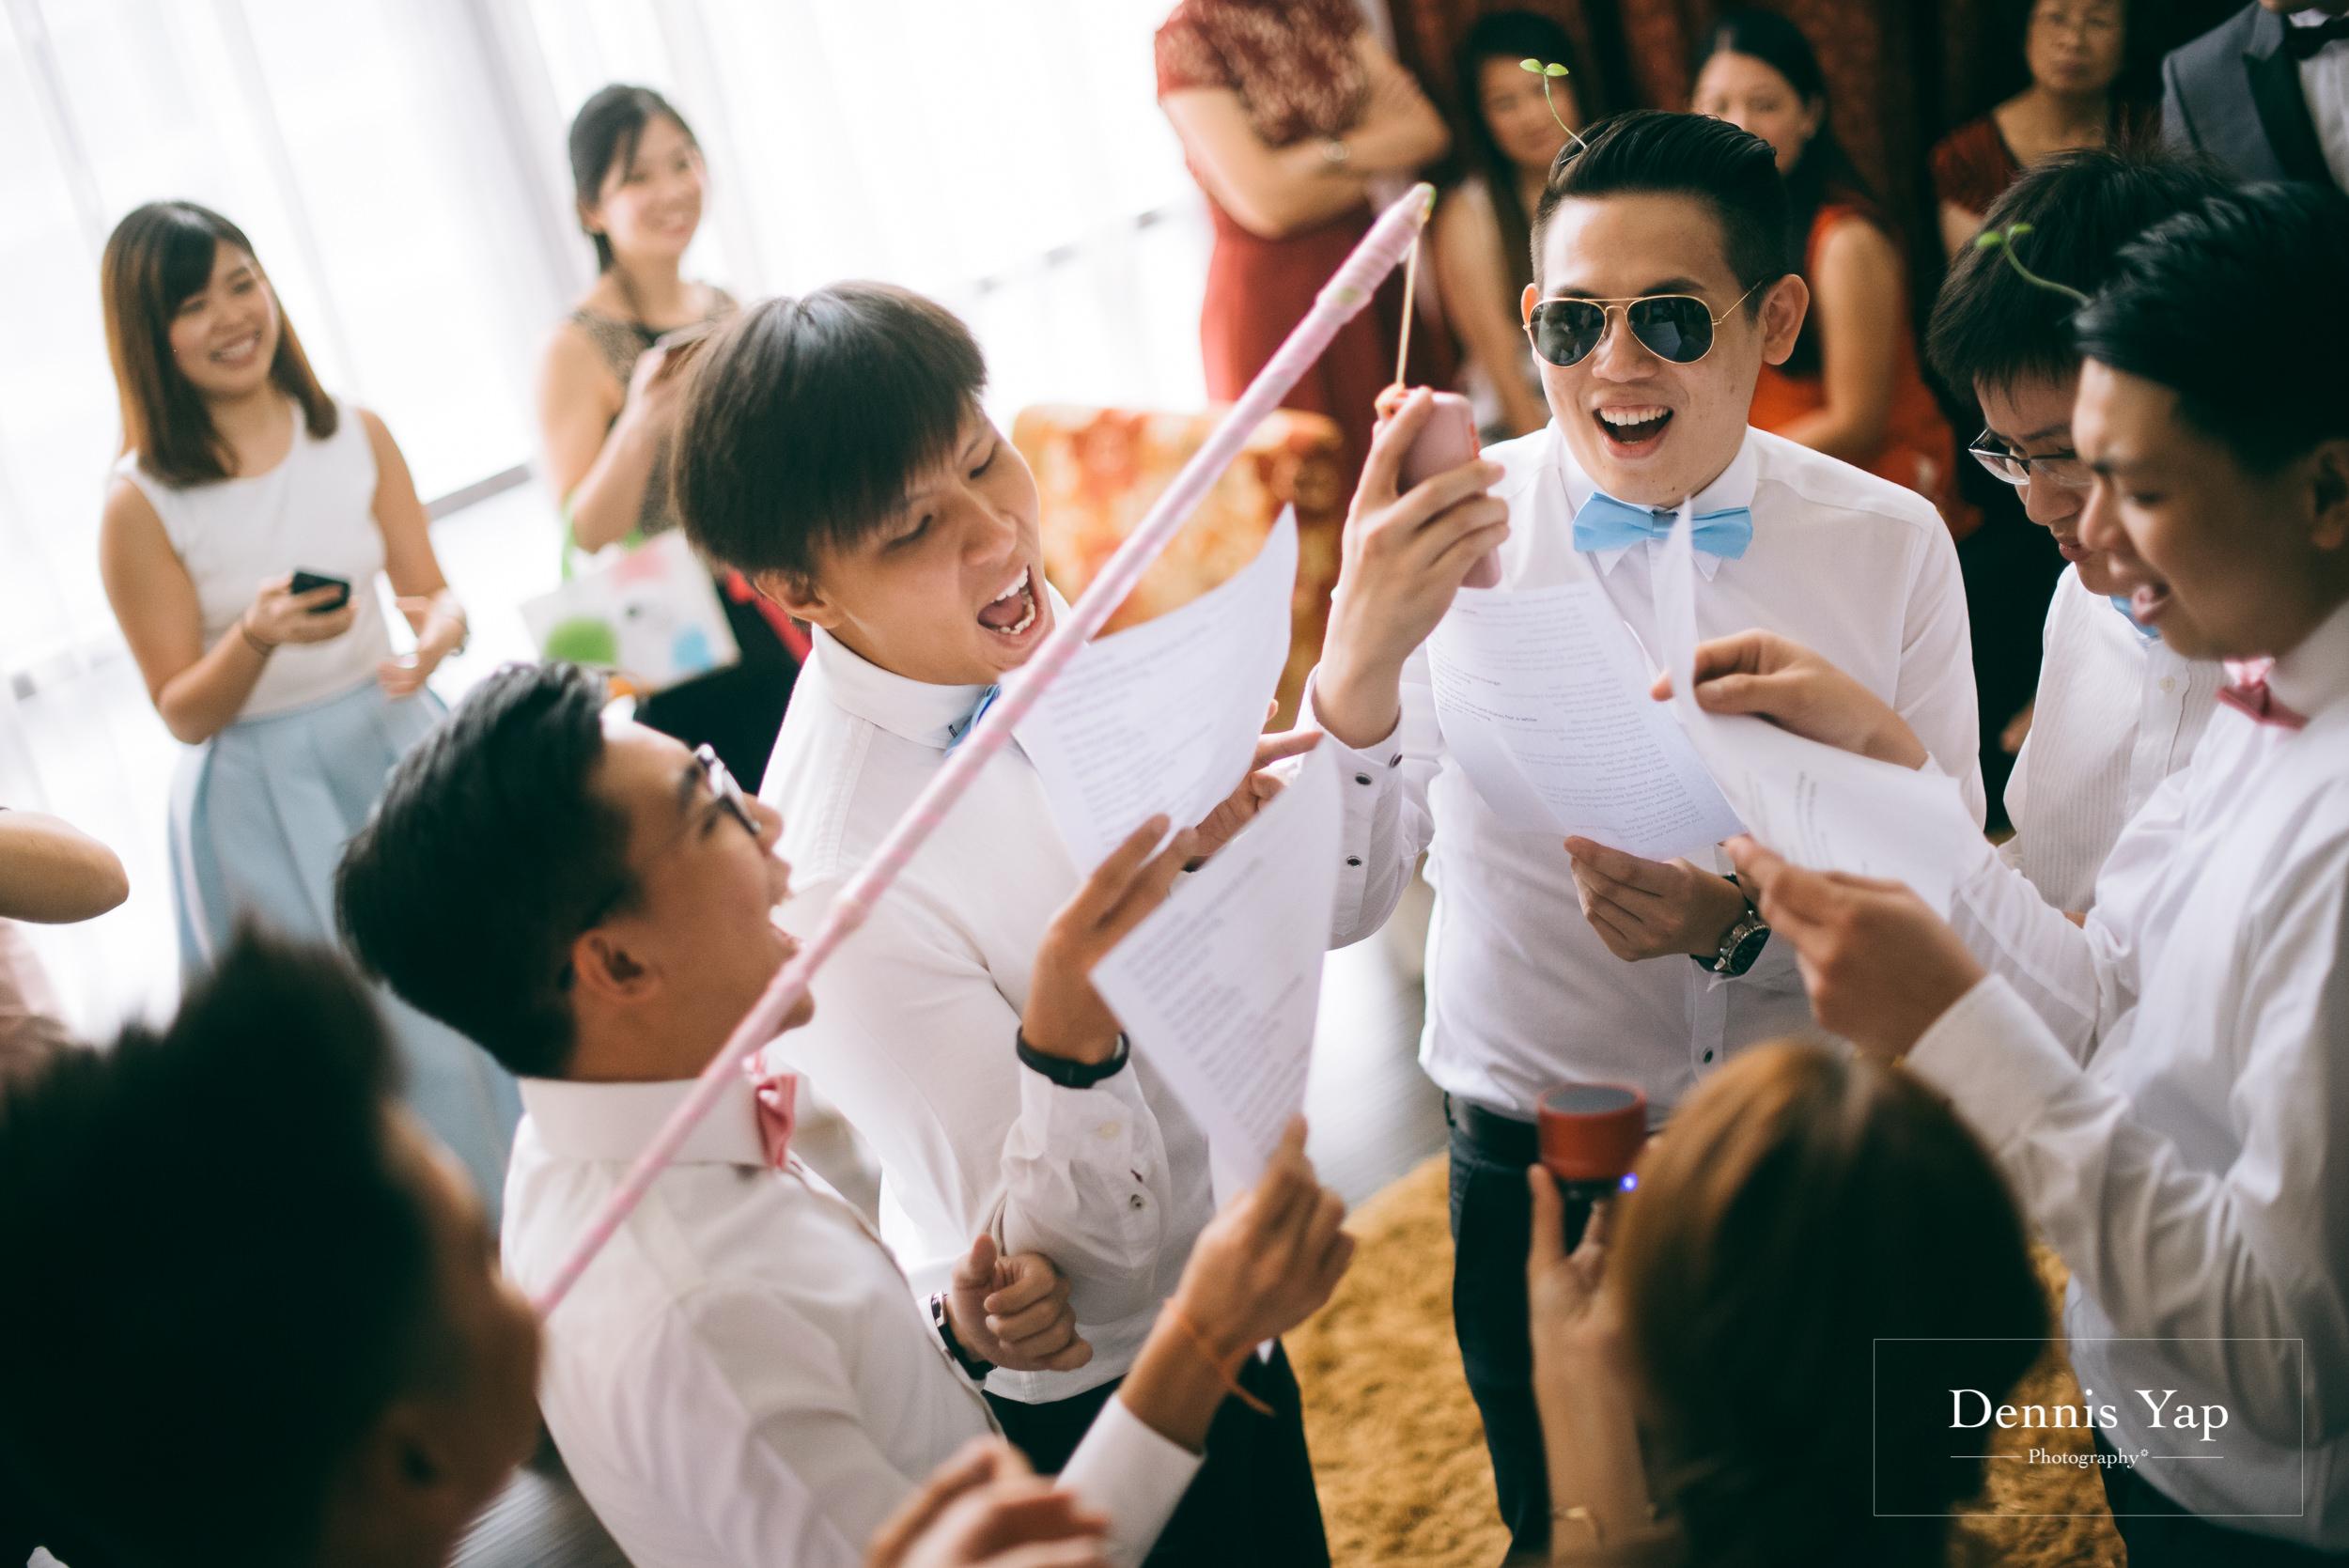 joon keat siew hui wedding day dennis yap malaysia wedding photographer-10.jpg